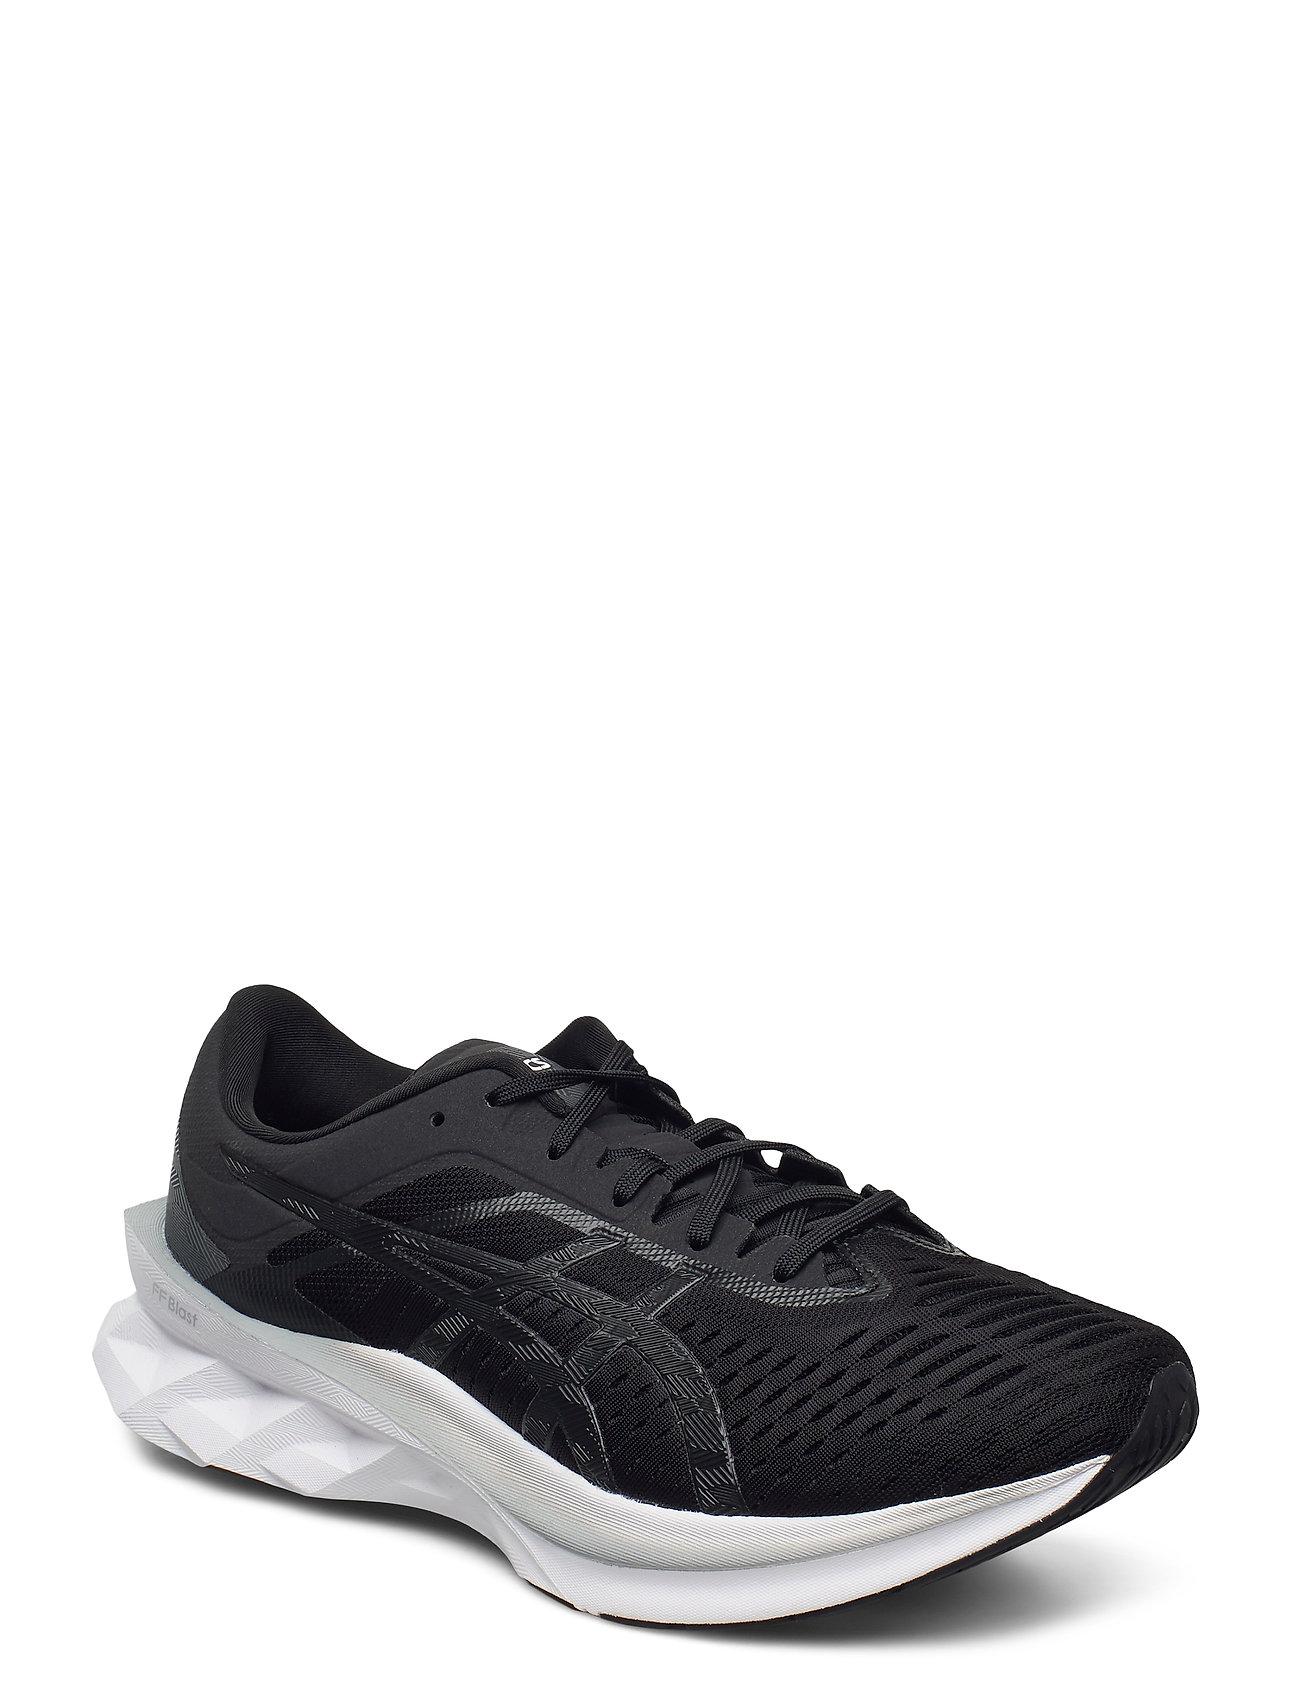 ASICS Sneaker   Novablast Shoes Sport Shoes Running Shoes Schwarz ASICS